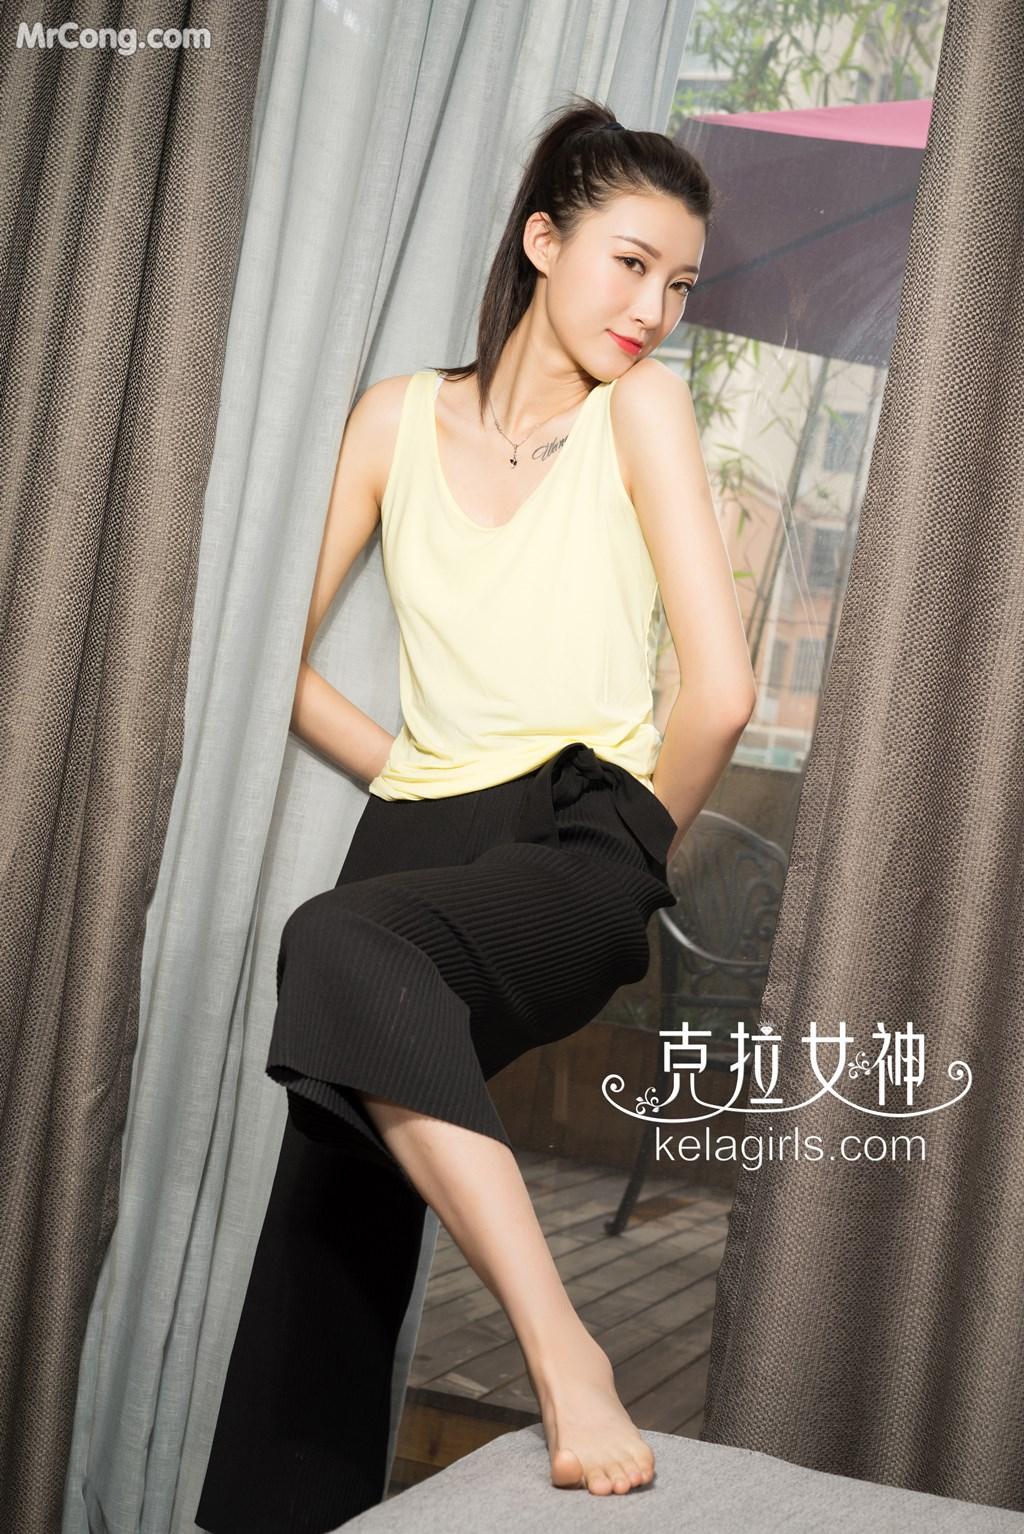 Image KelaGirls-2017-08-09-Zhao-Yujing-MrCong.com-004 in post KelaGirls 2017-08-09: Người mẫu Zhao Yujing (赵雨静) (21 ảnh)